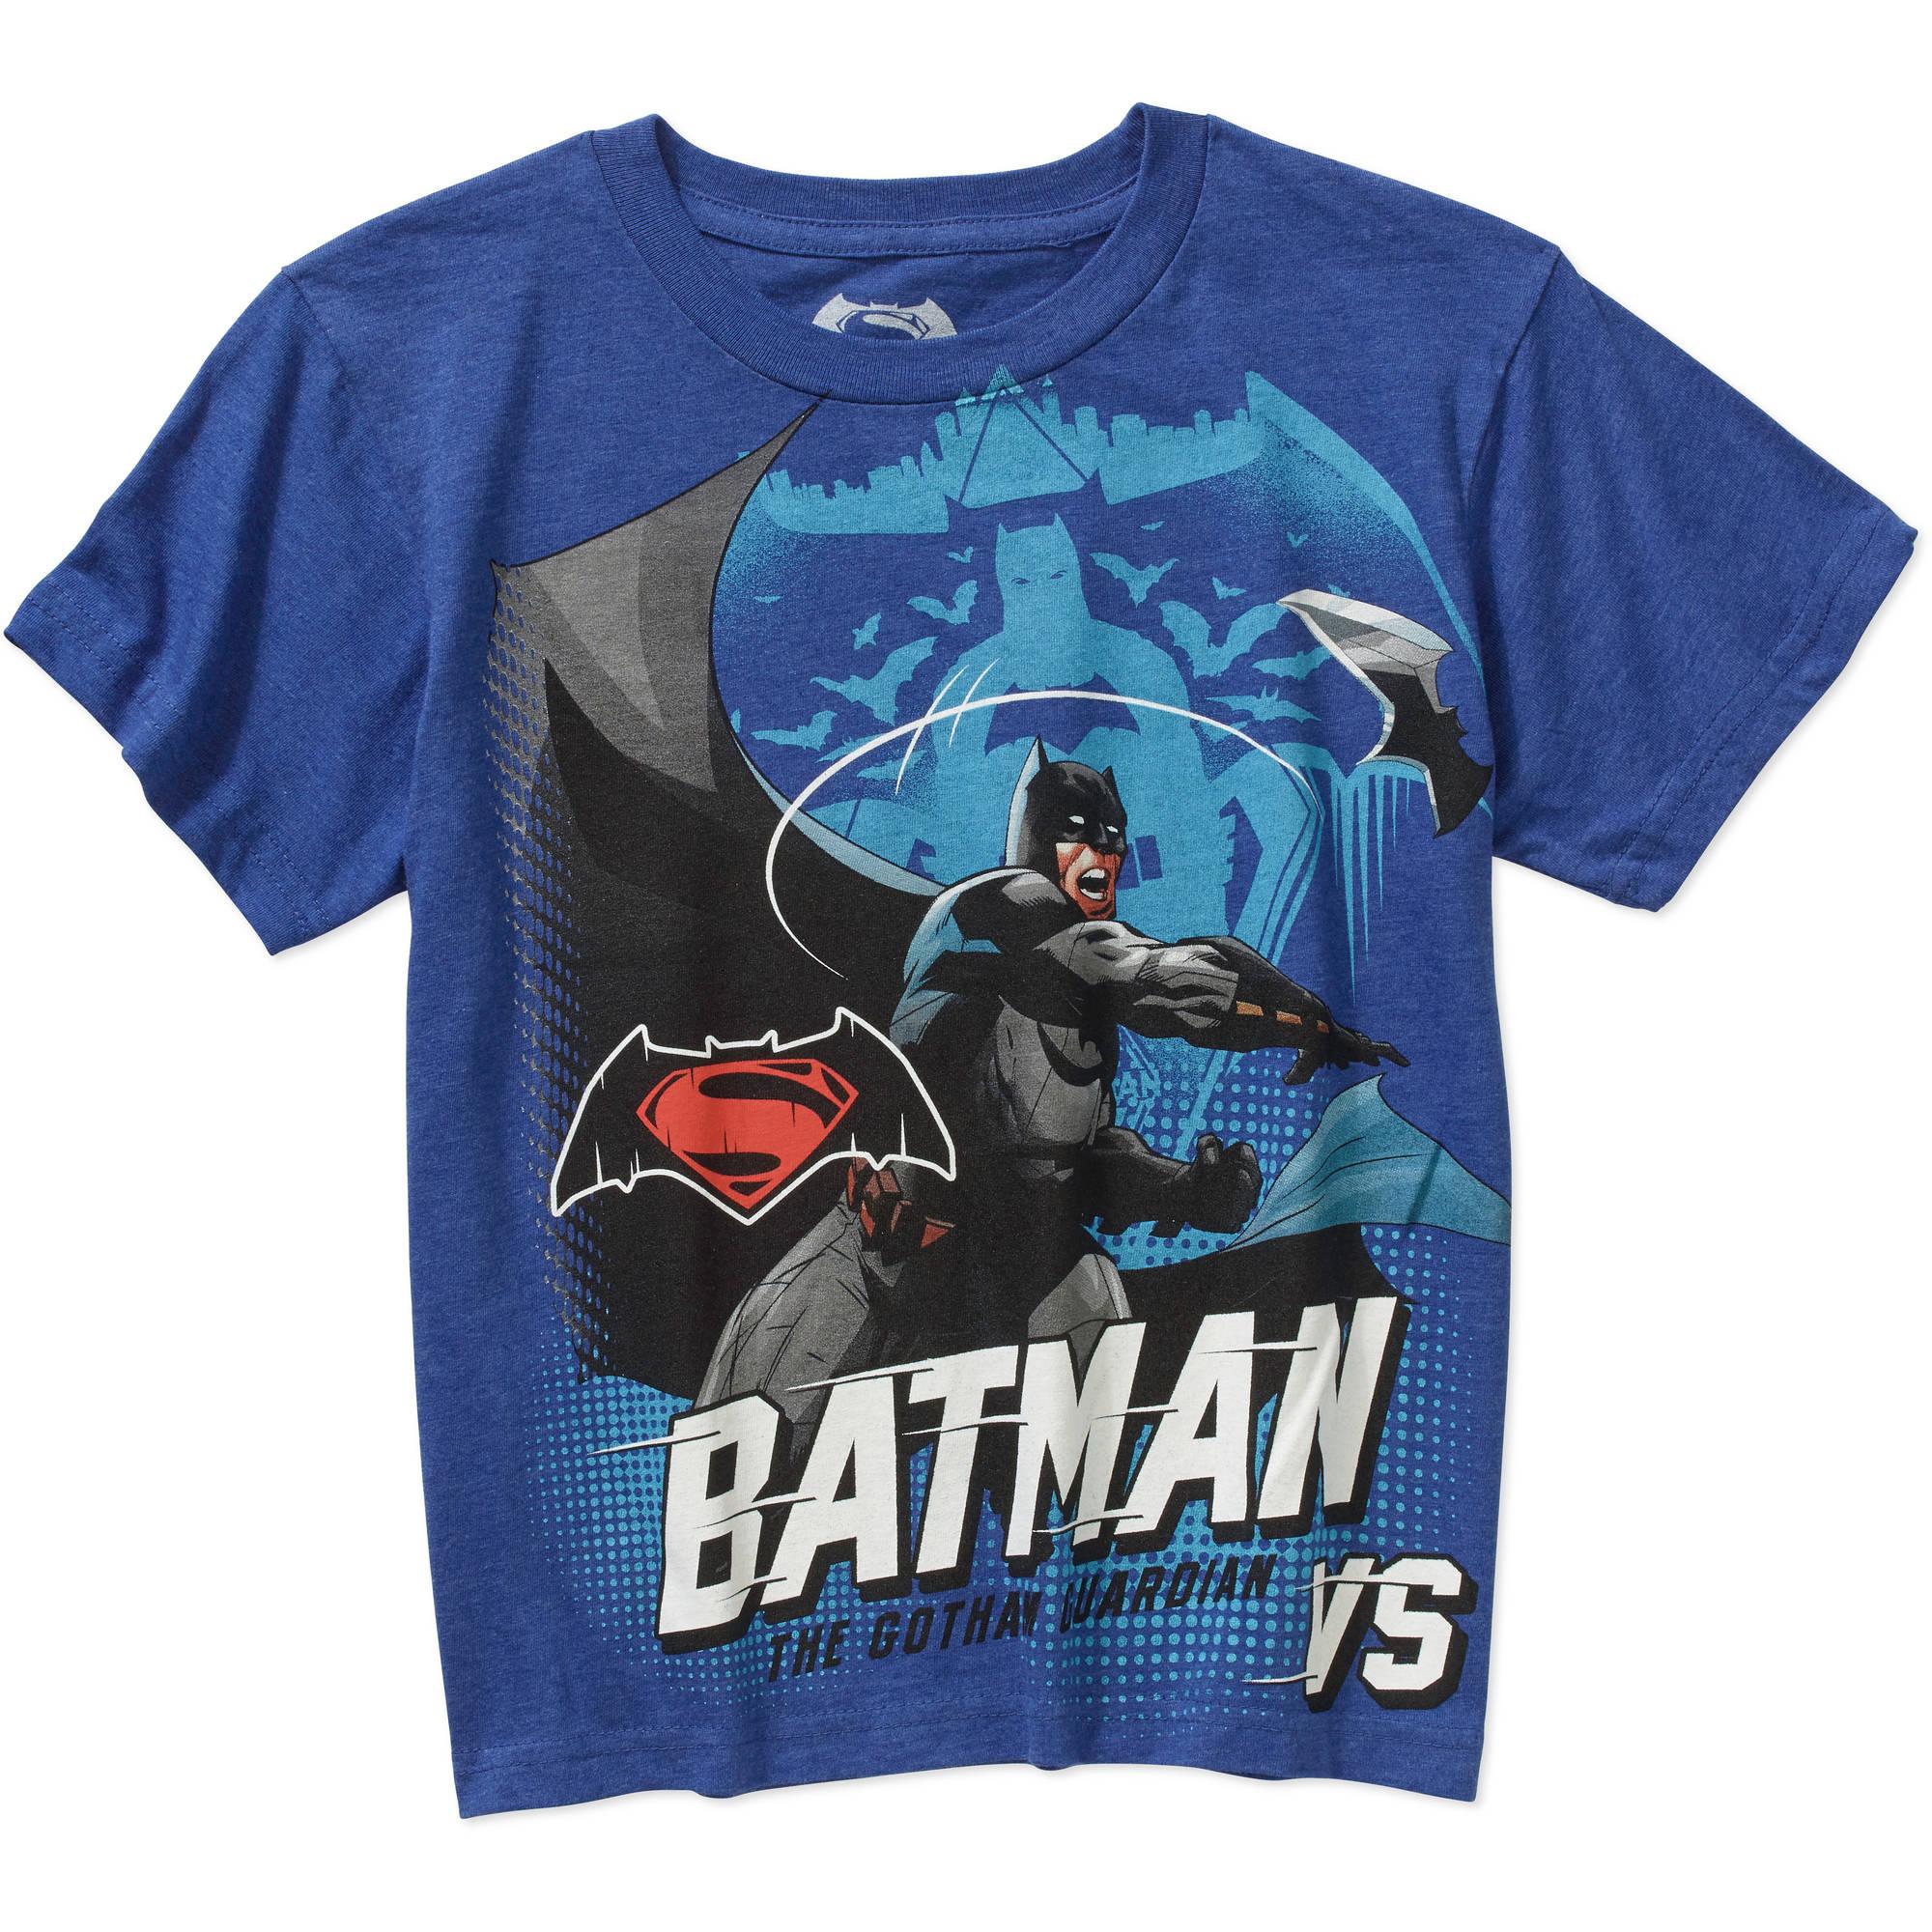 DC Comics Batman Dawn of Justice Short Sleeve Graphic Tee